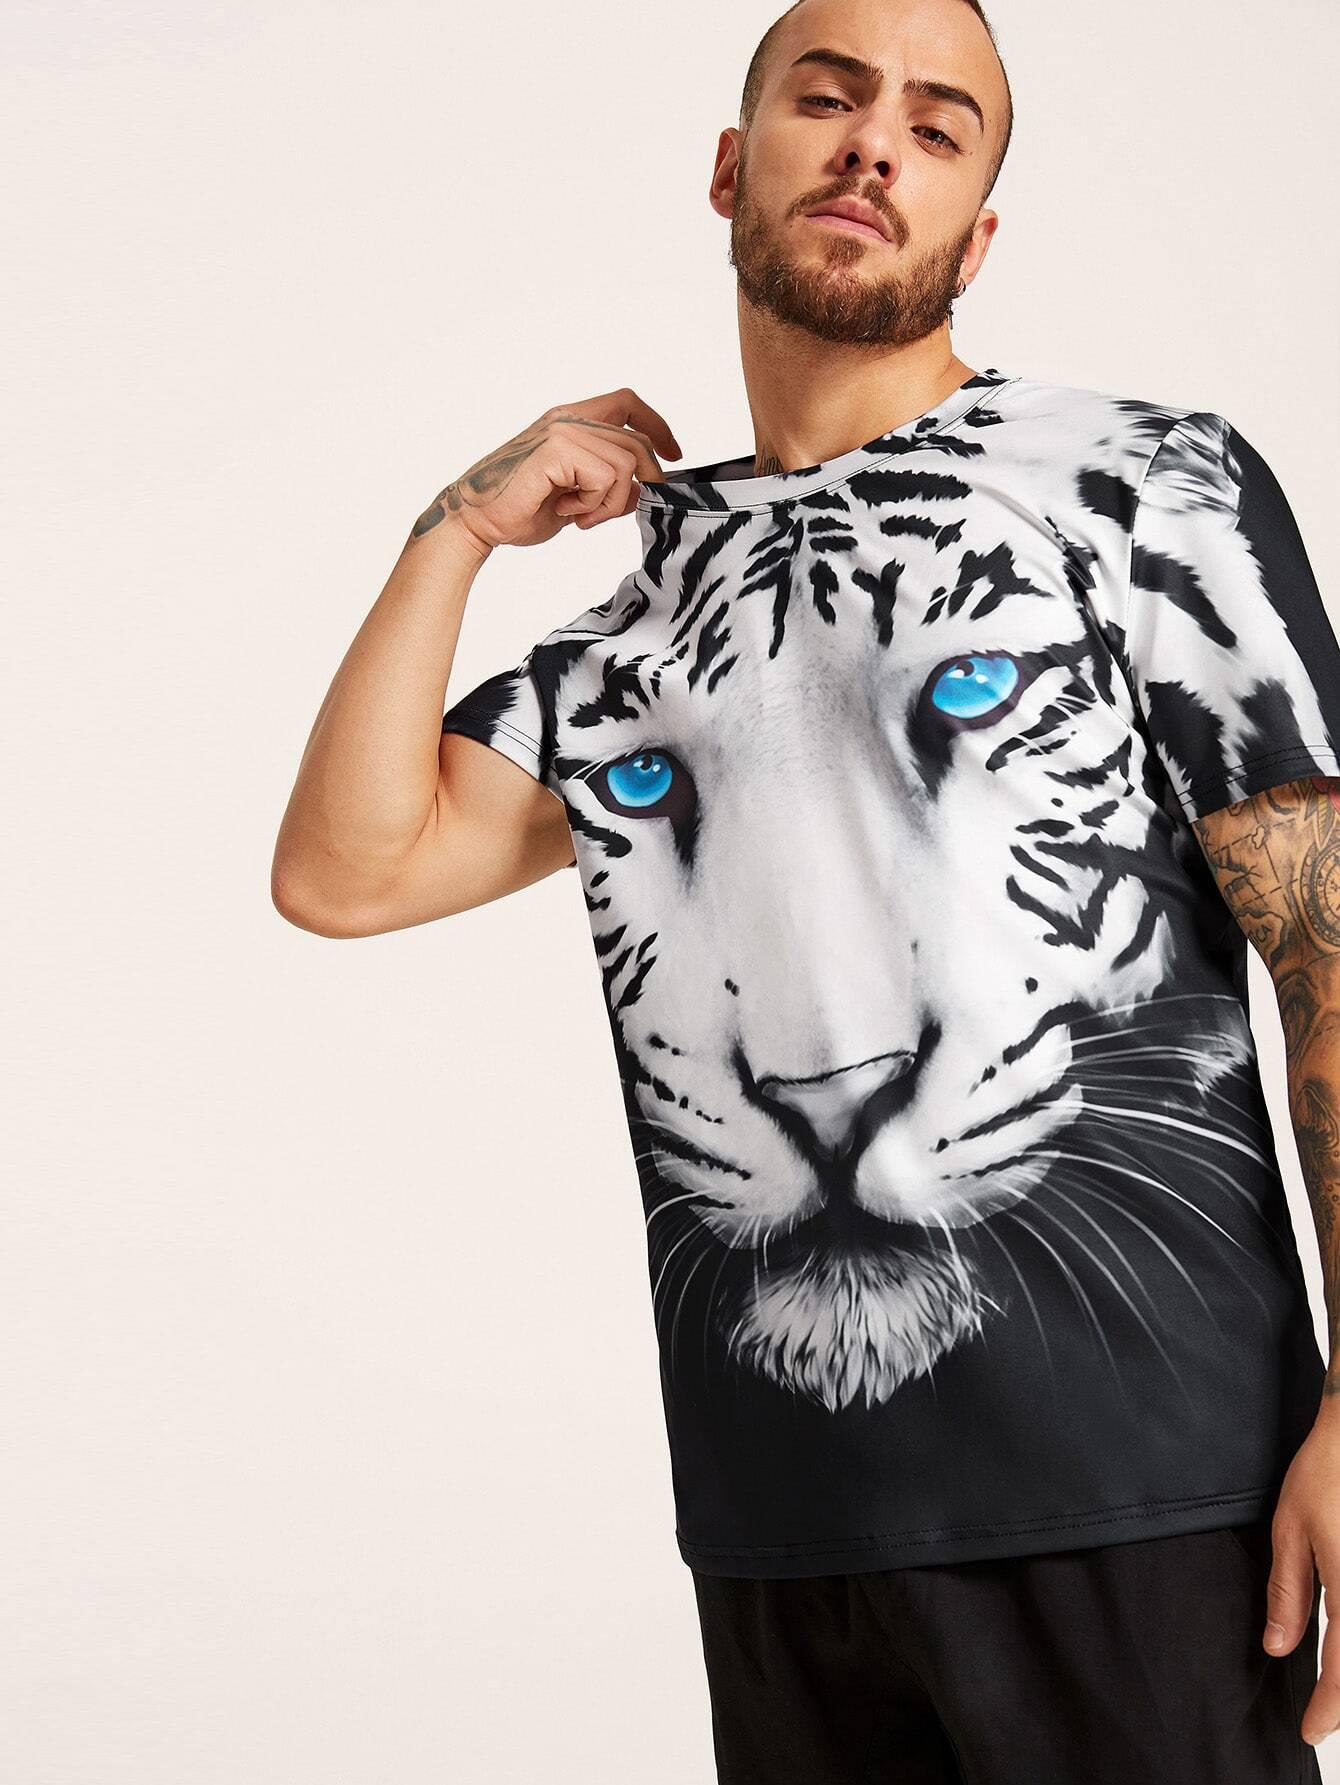 Фото - Мужская футболка с принтом 3D тигра от SheIn цвет чёрнобелые